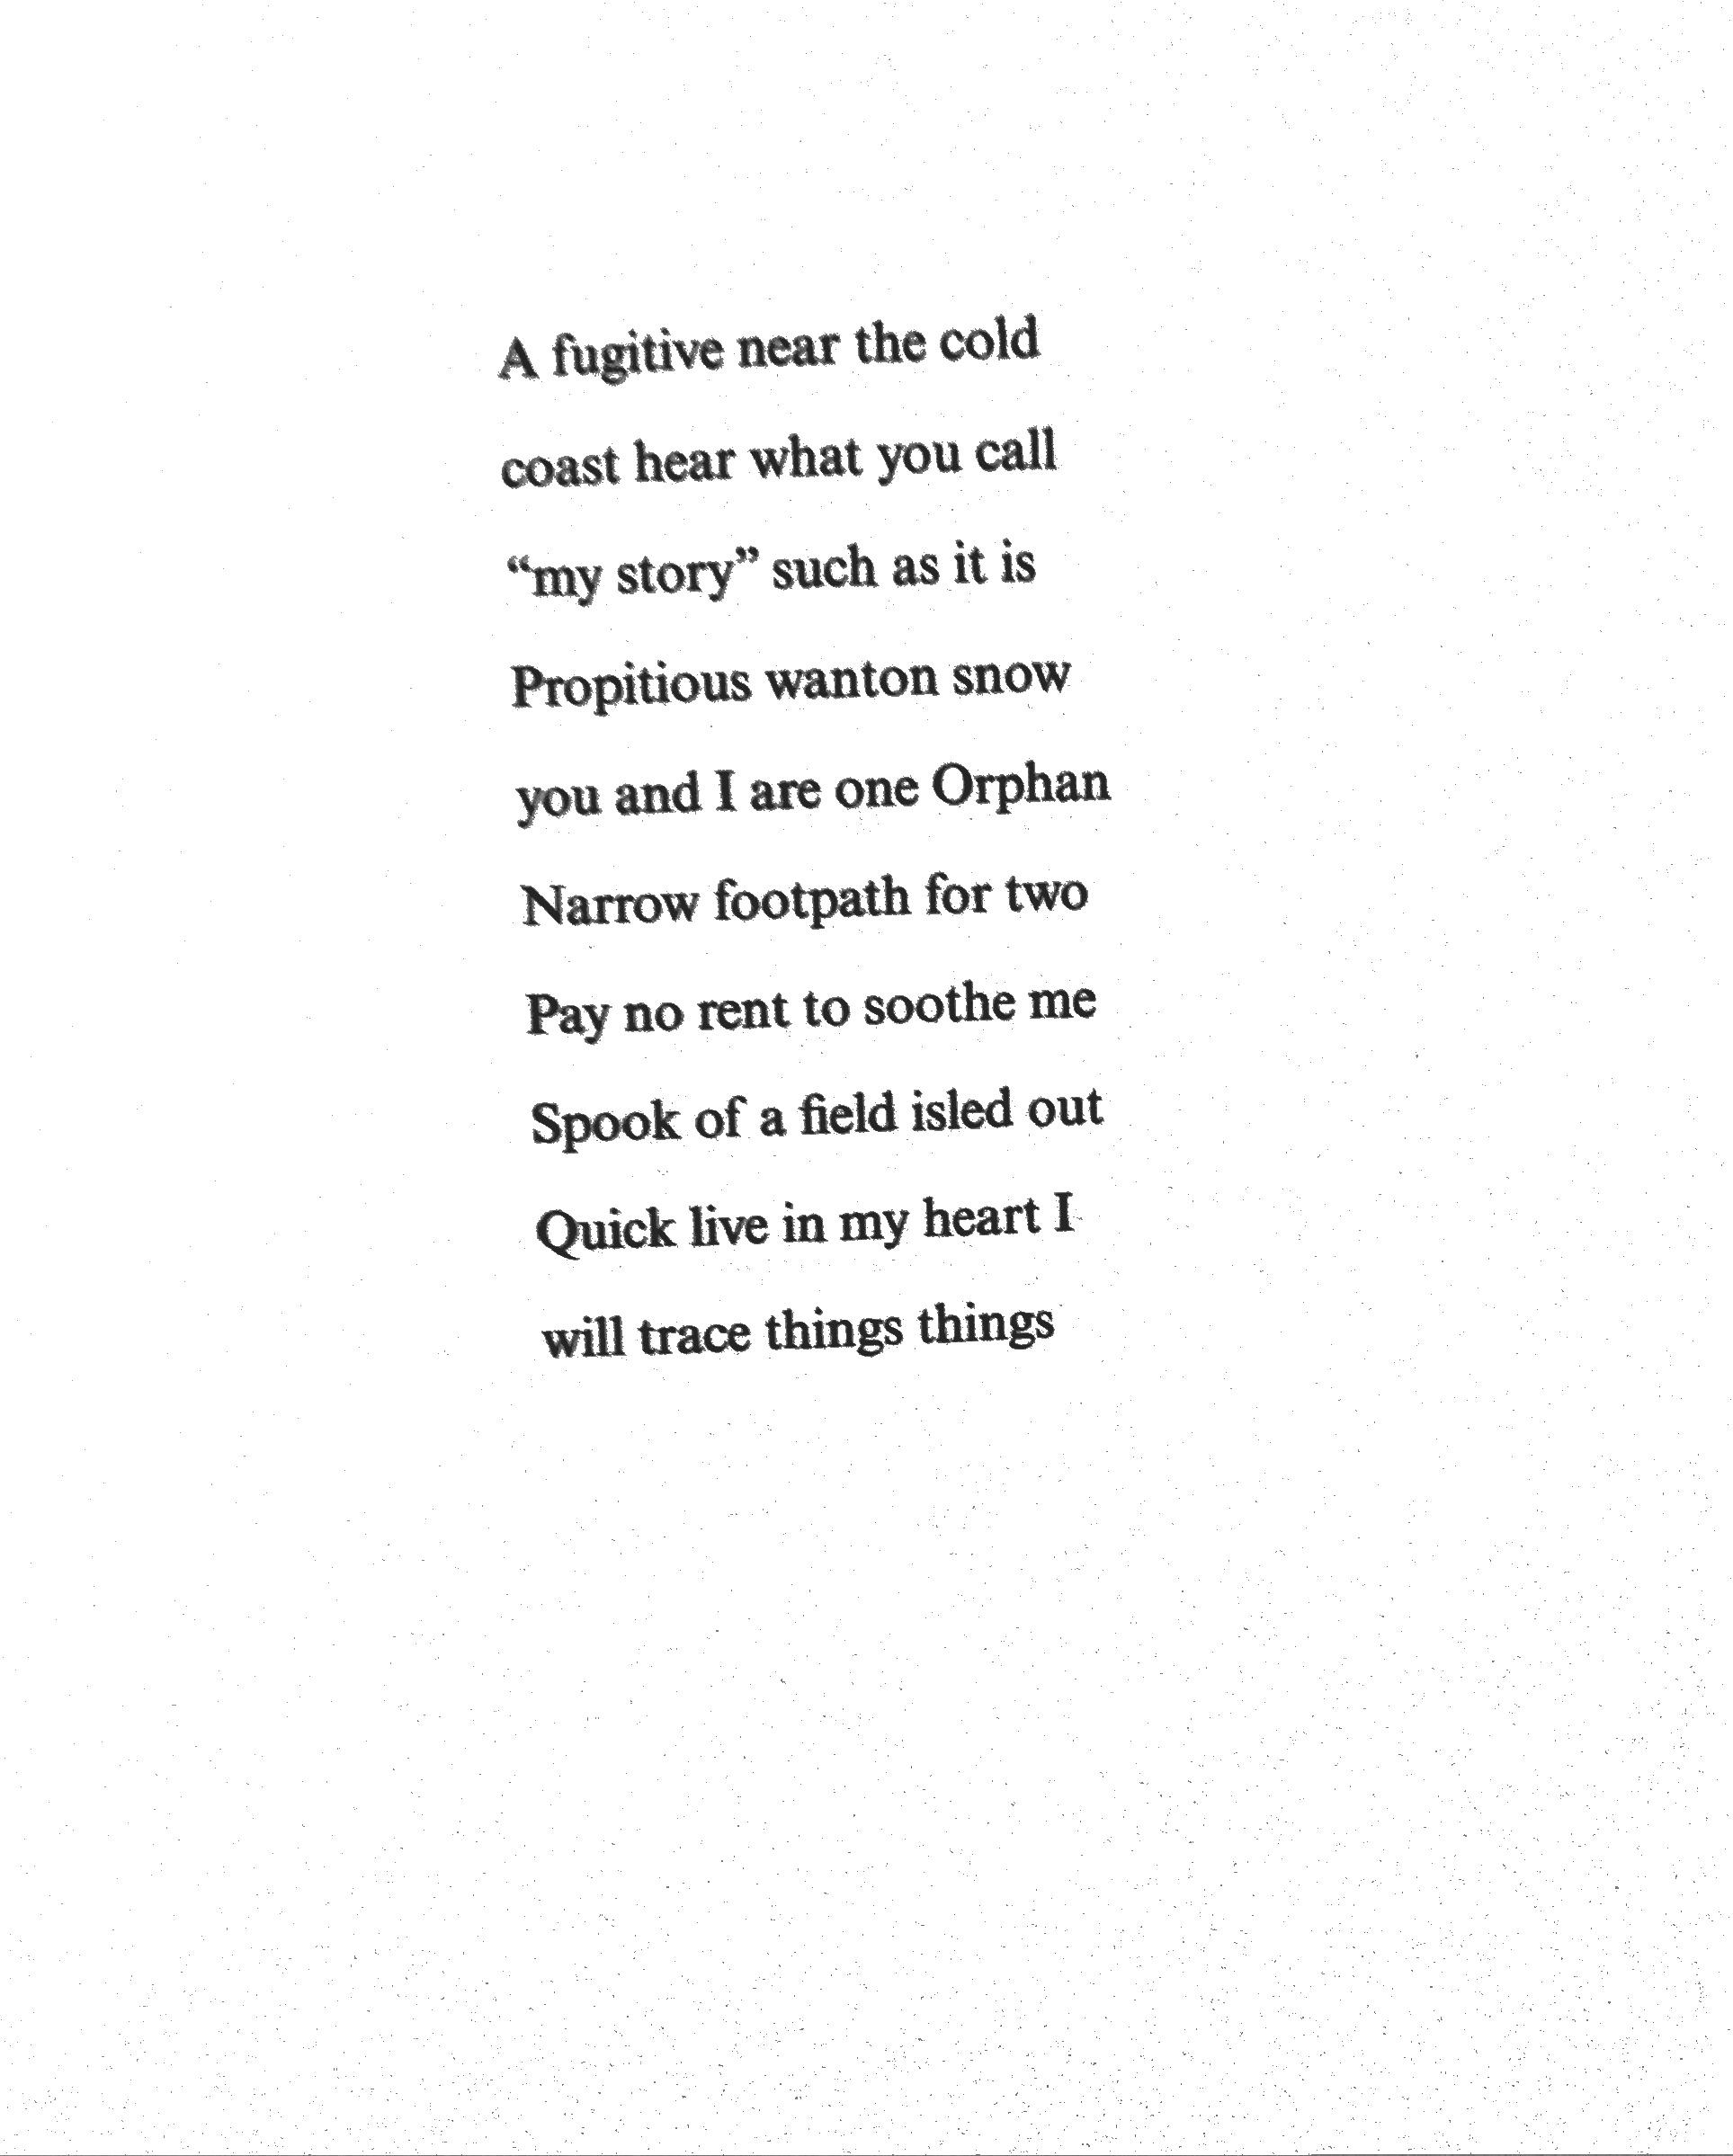 lyric poem examples Gallery